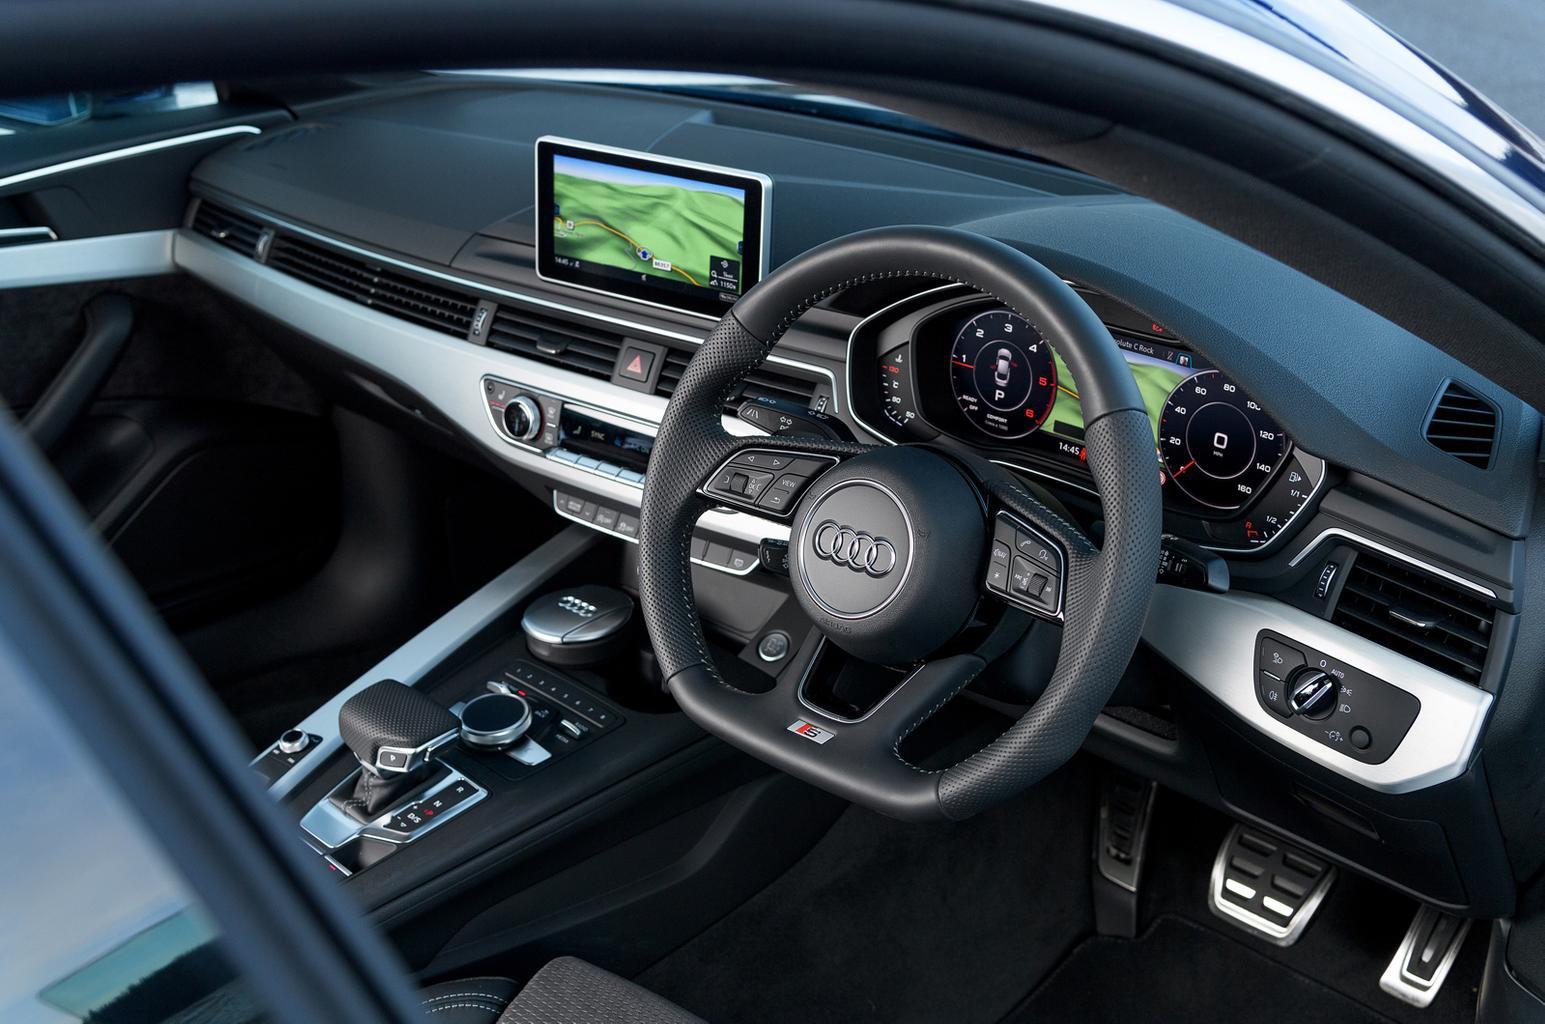 2017 Audi A5 Sportback 2.0 TDI Ultra 190 review